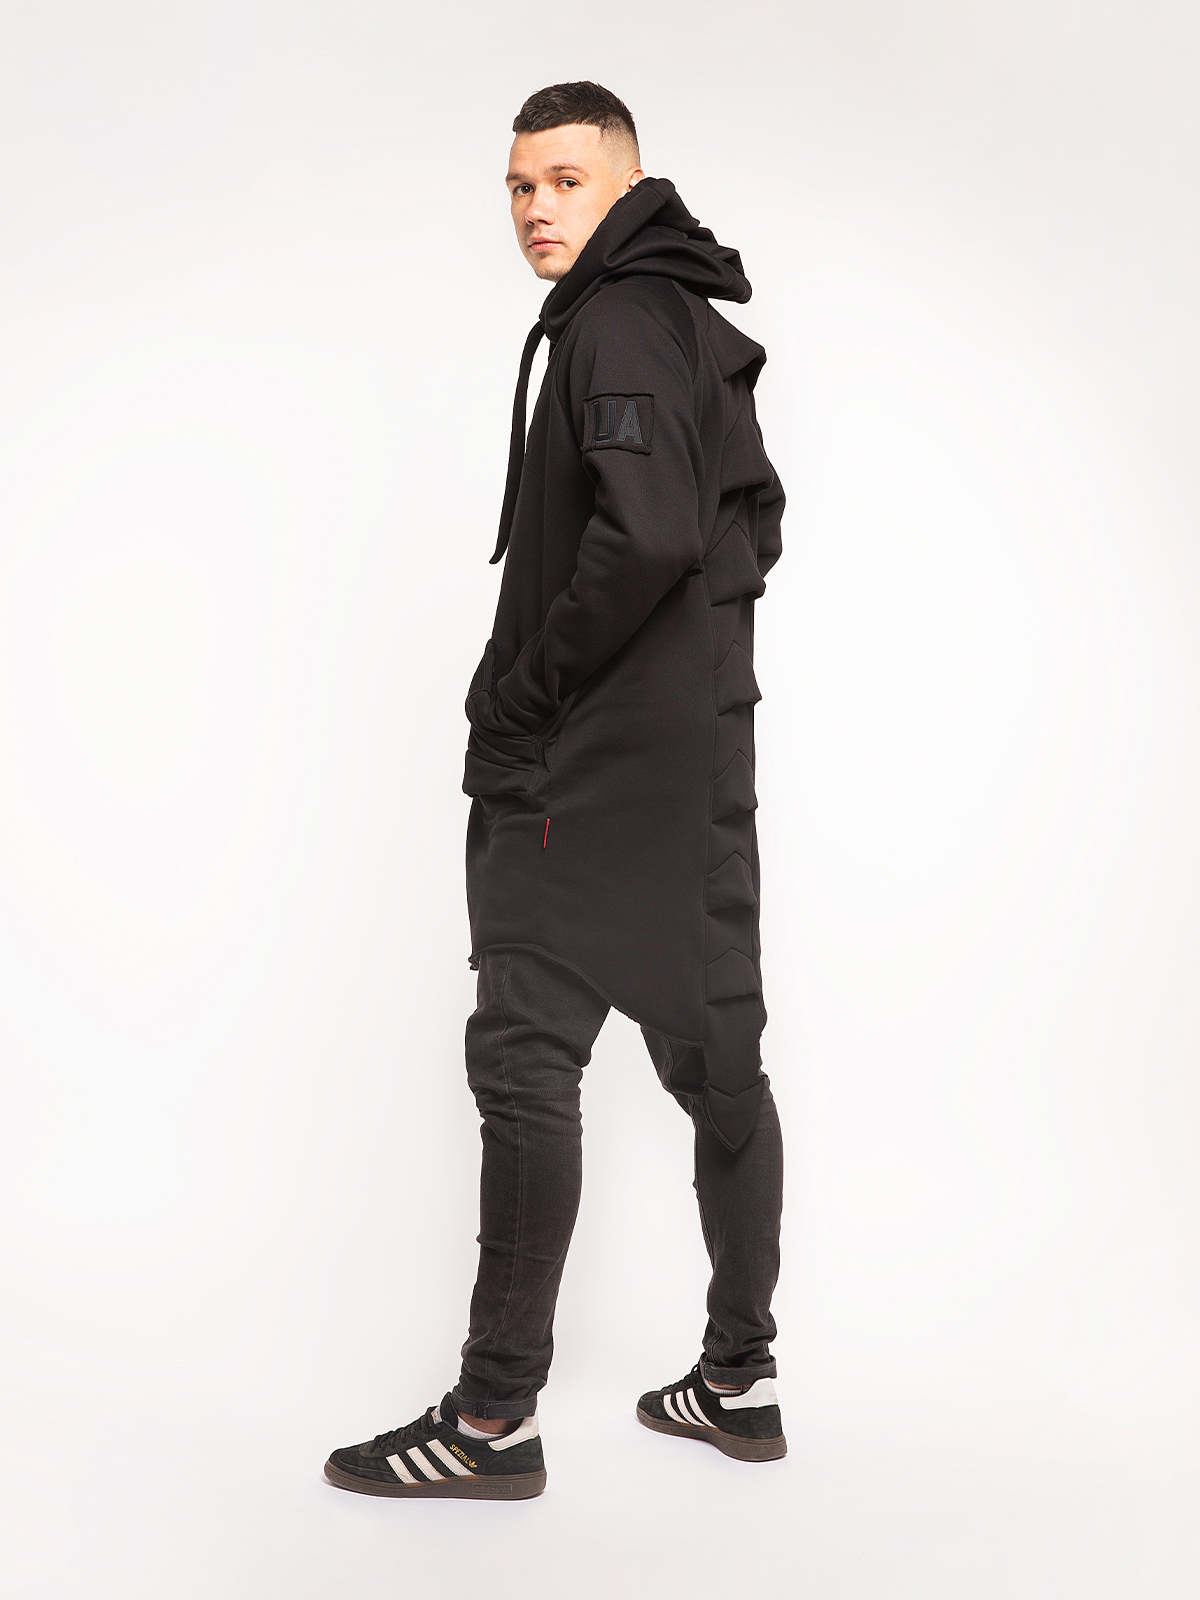 Men's Hoodie Dragon. Color black. 6.